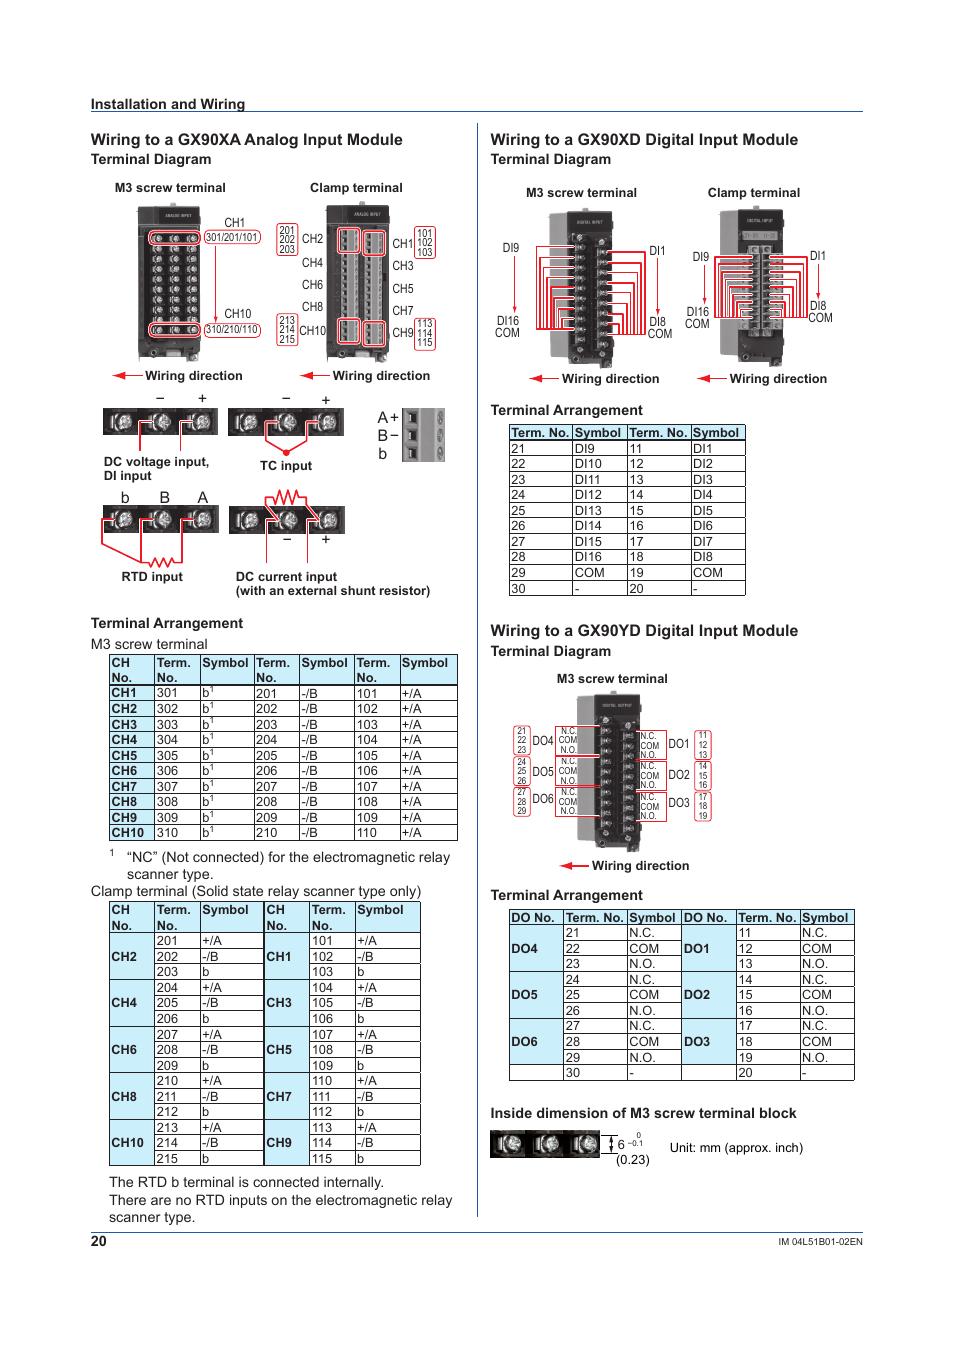 hight resolution of wiring to a gx90xa analog input module ab b b b wiring to a gx90xd digital